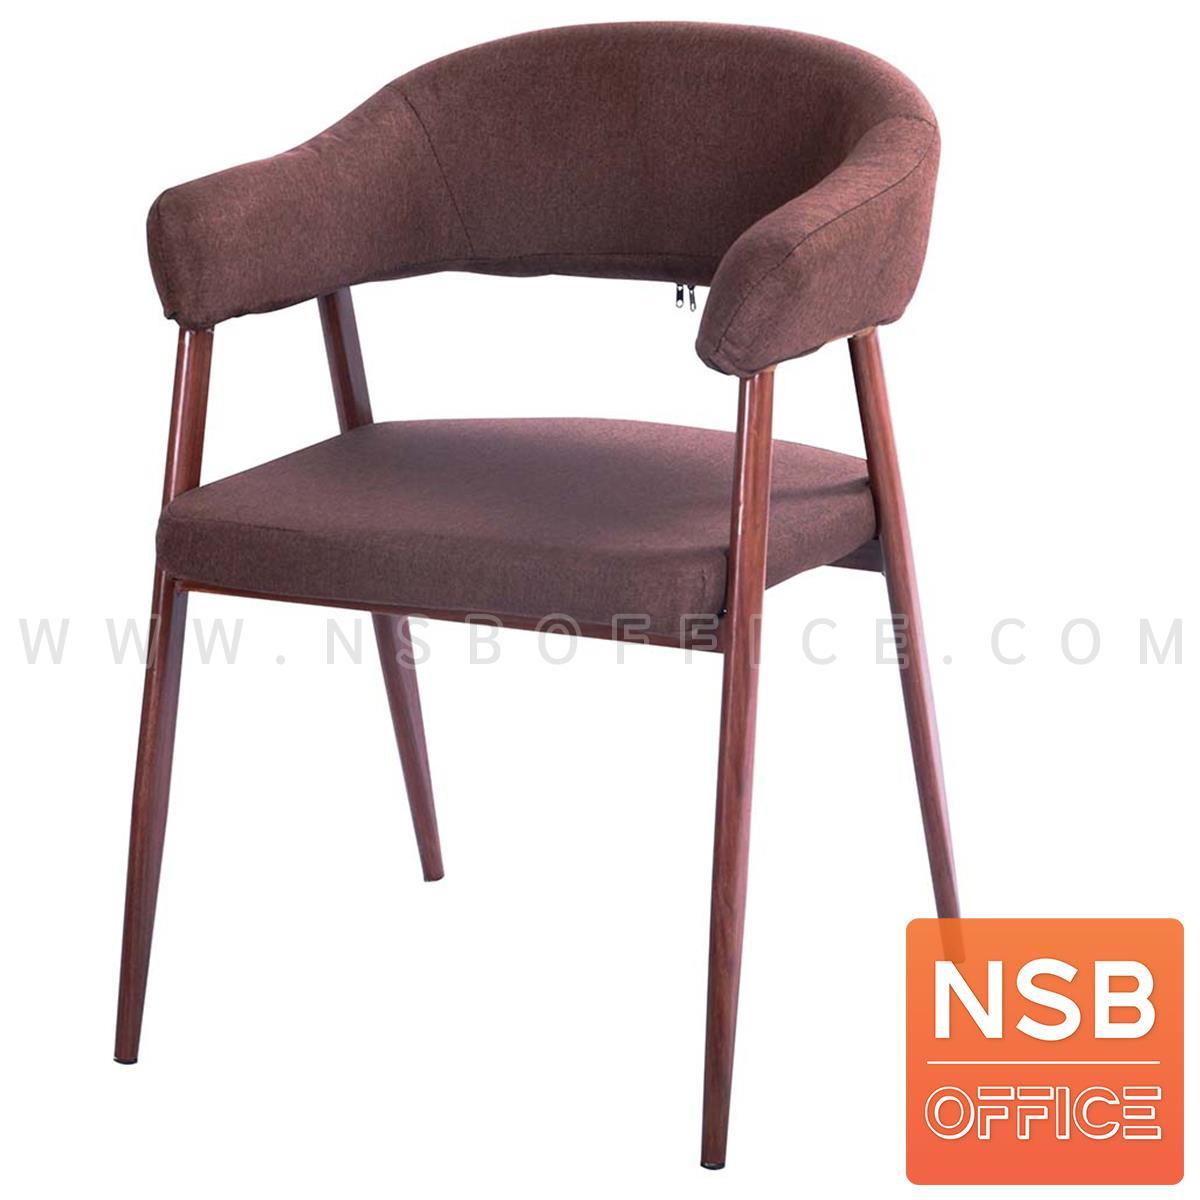 B29A382:เก้าอี้โมเดิร์นหุ้มผ้า รุ่น Novel (โนเวล)  ขาเหล็กลายไม้